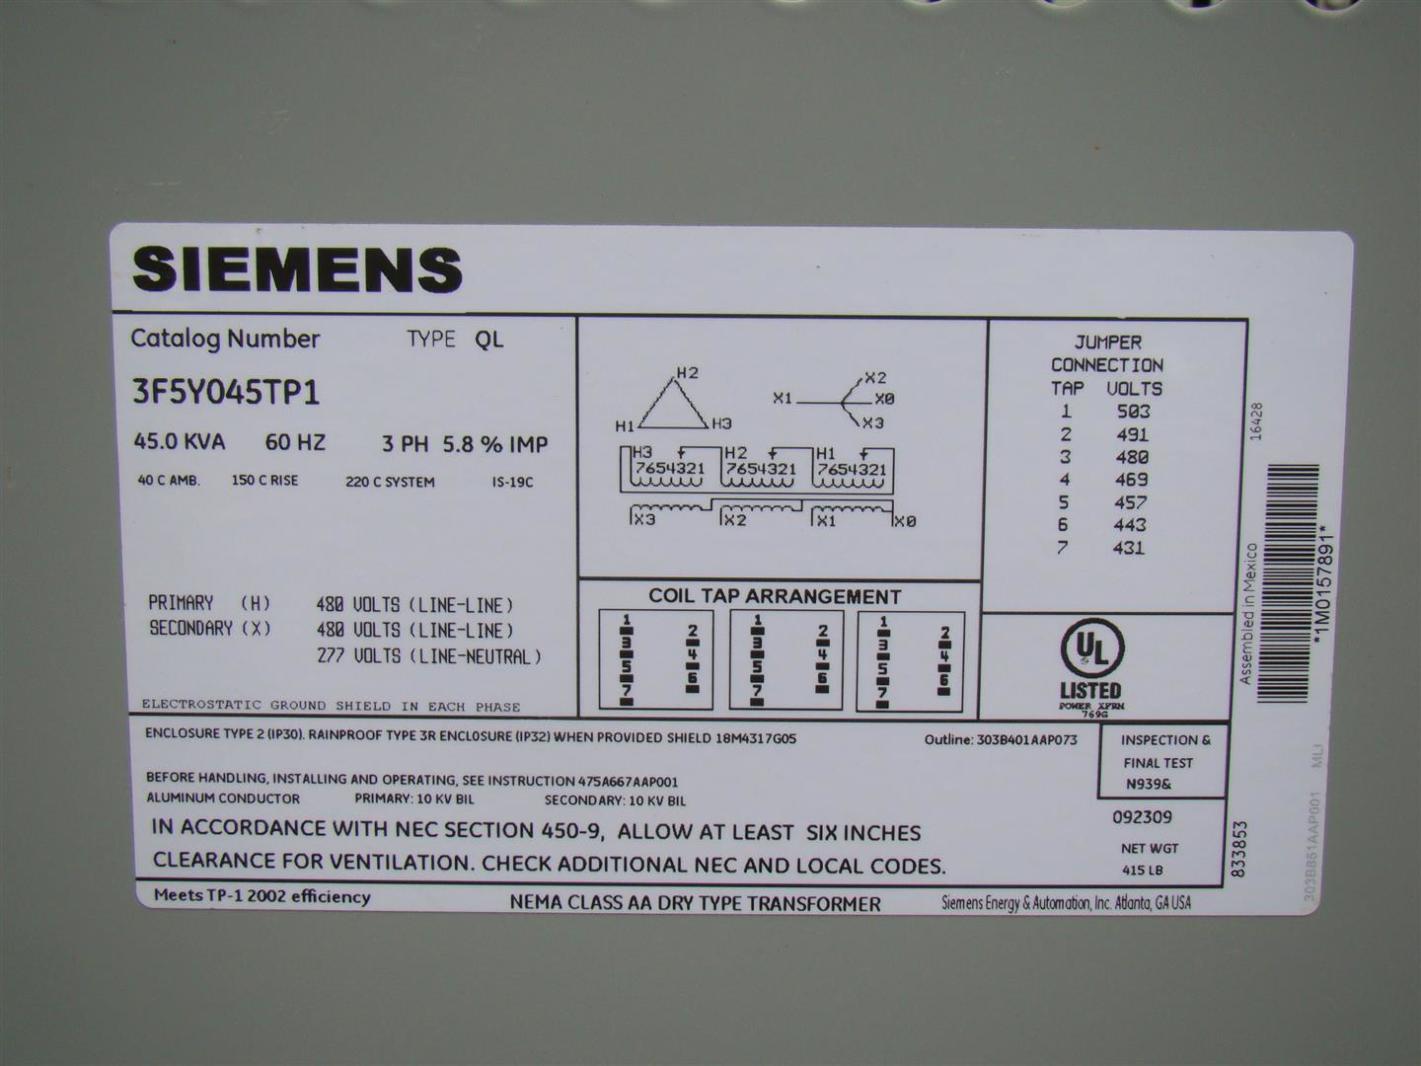 hight resolution of siemens 3 phase transformer 480 x 480 277 volt 45 kva 3f5y045tp1